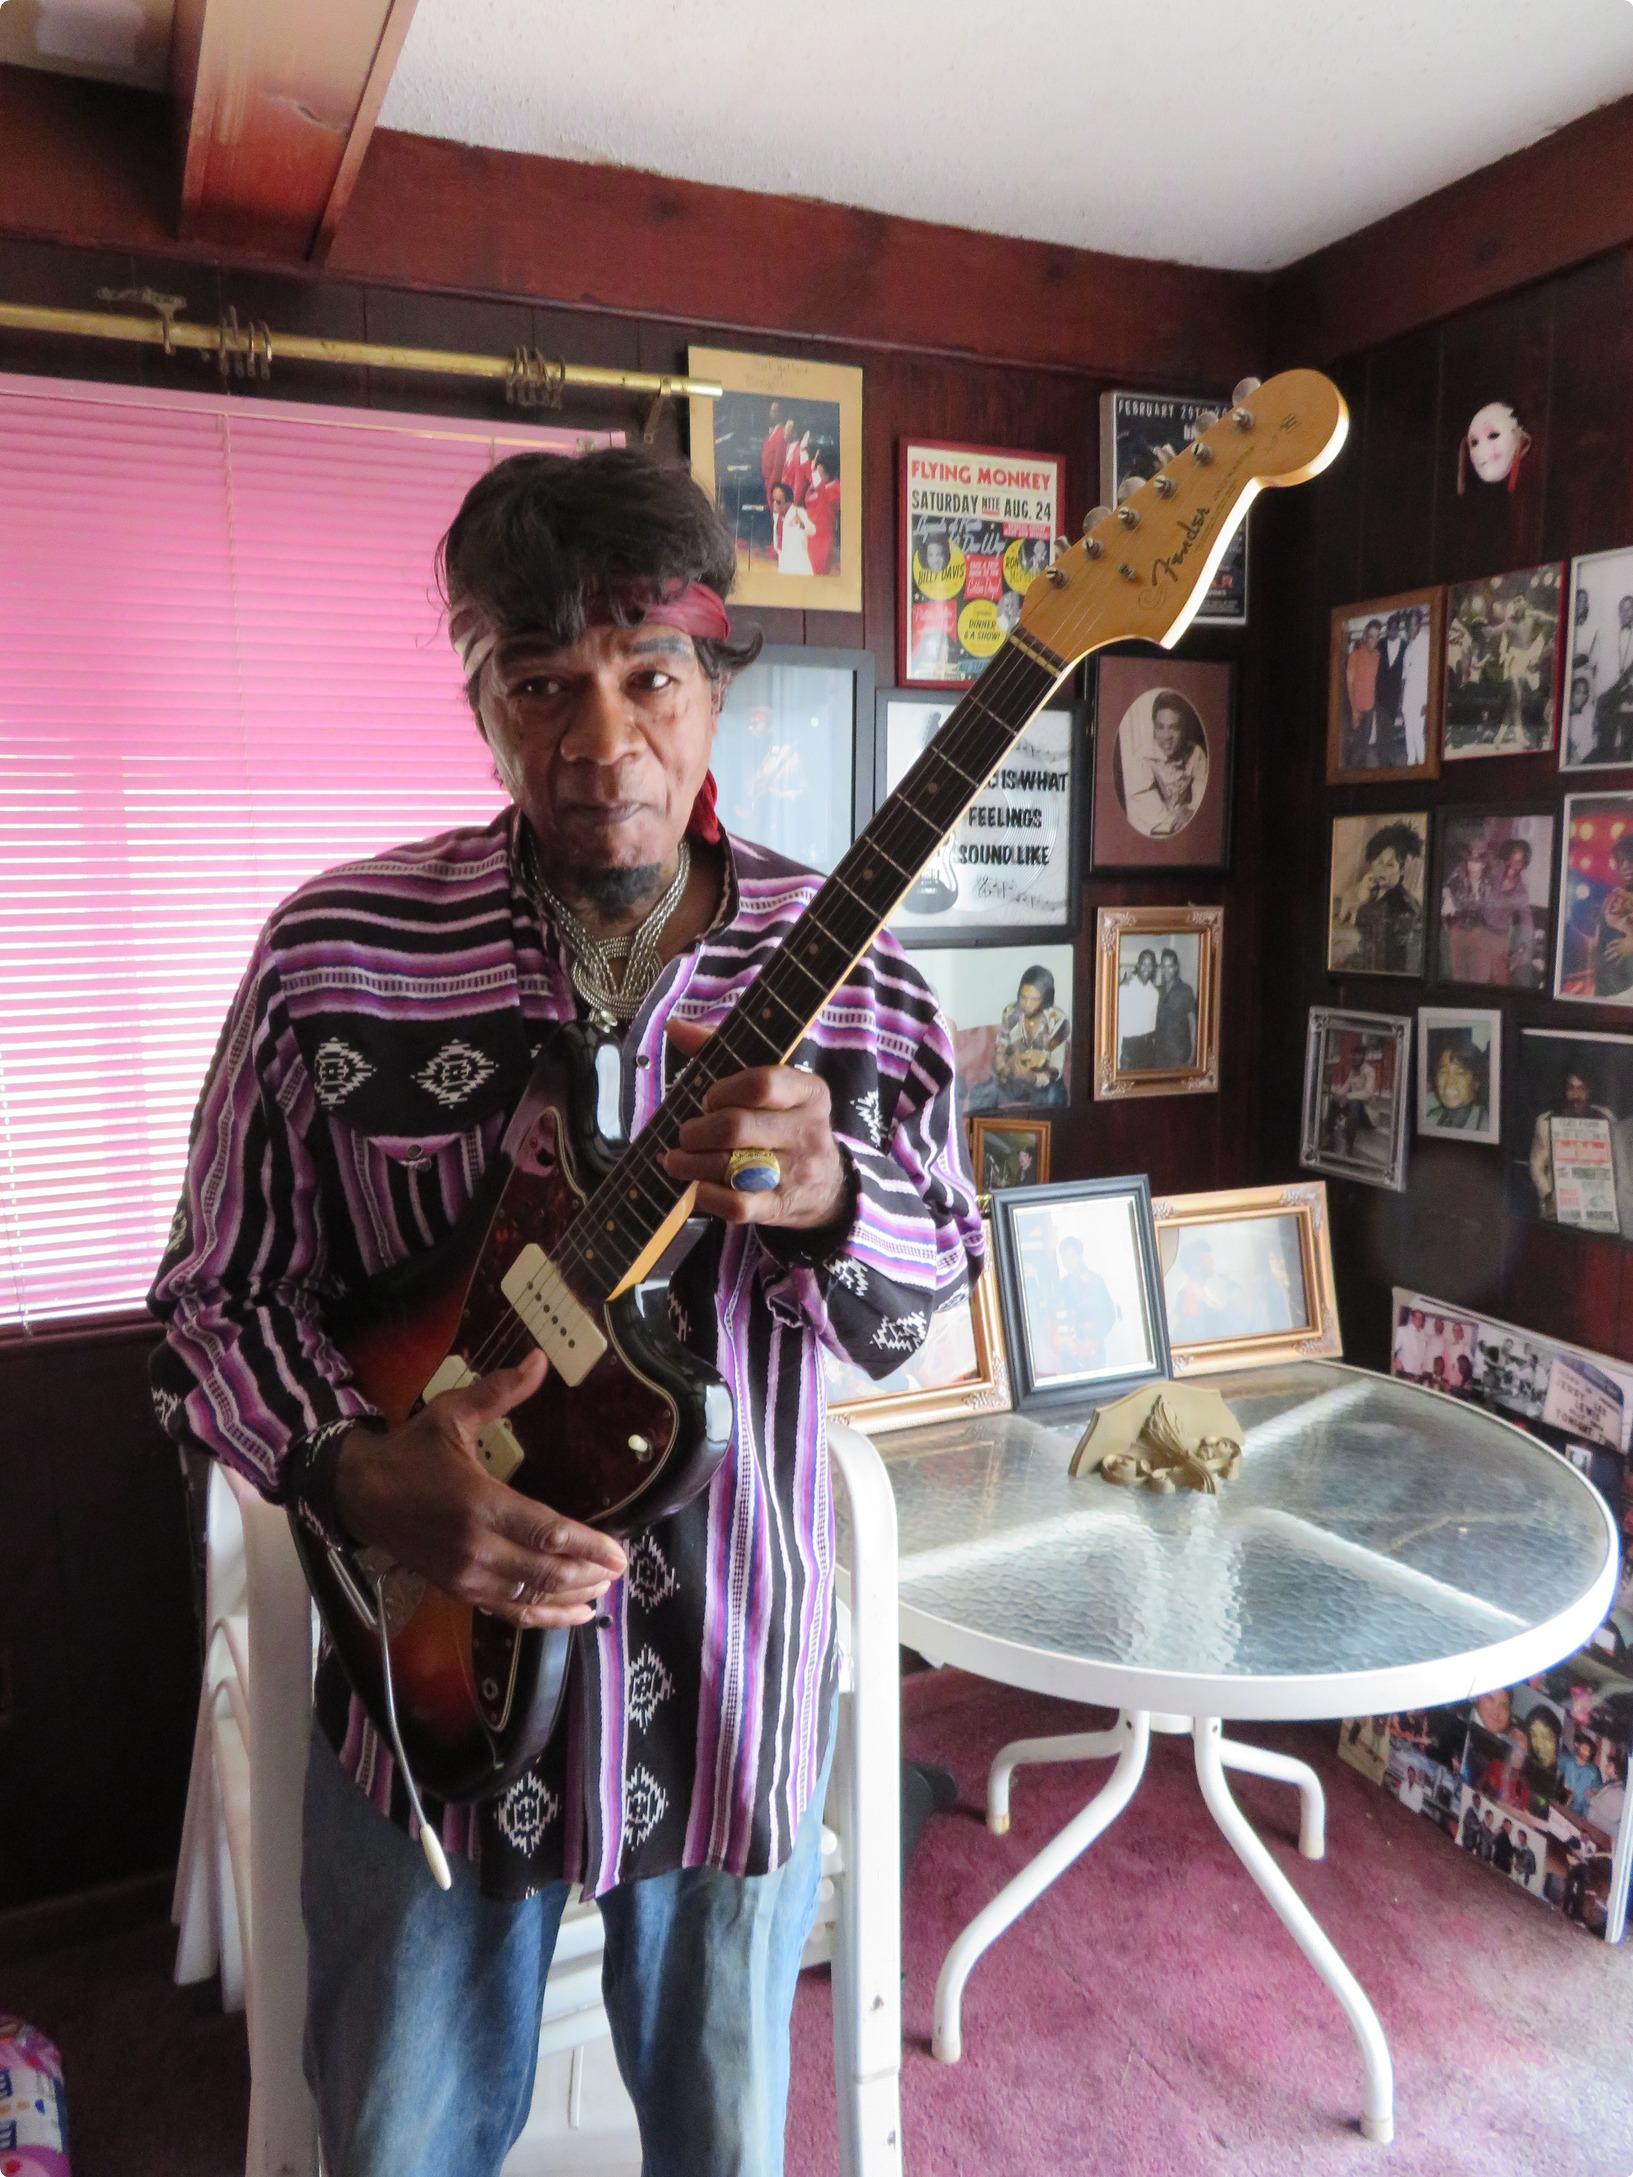 fender jimi hendrix jazzmaster 1964 sunburst guitar for sale rock wiring diagram jimi hendrix jazzmaster guitar fender telecaster wiring [ 1633 x 2177 Pixel ]